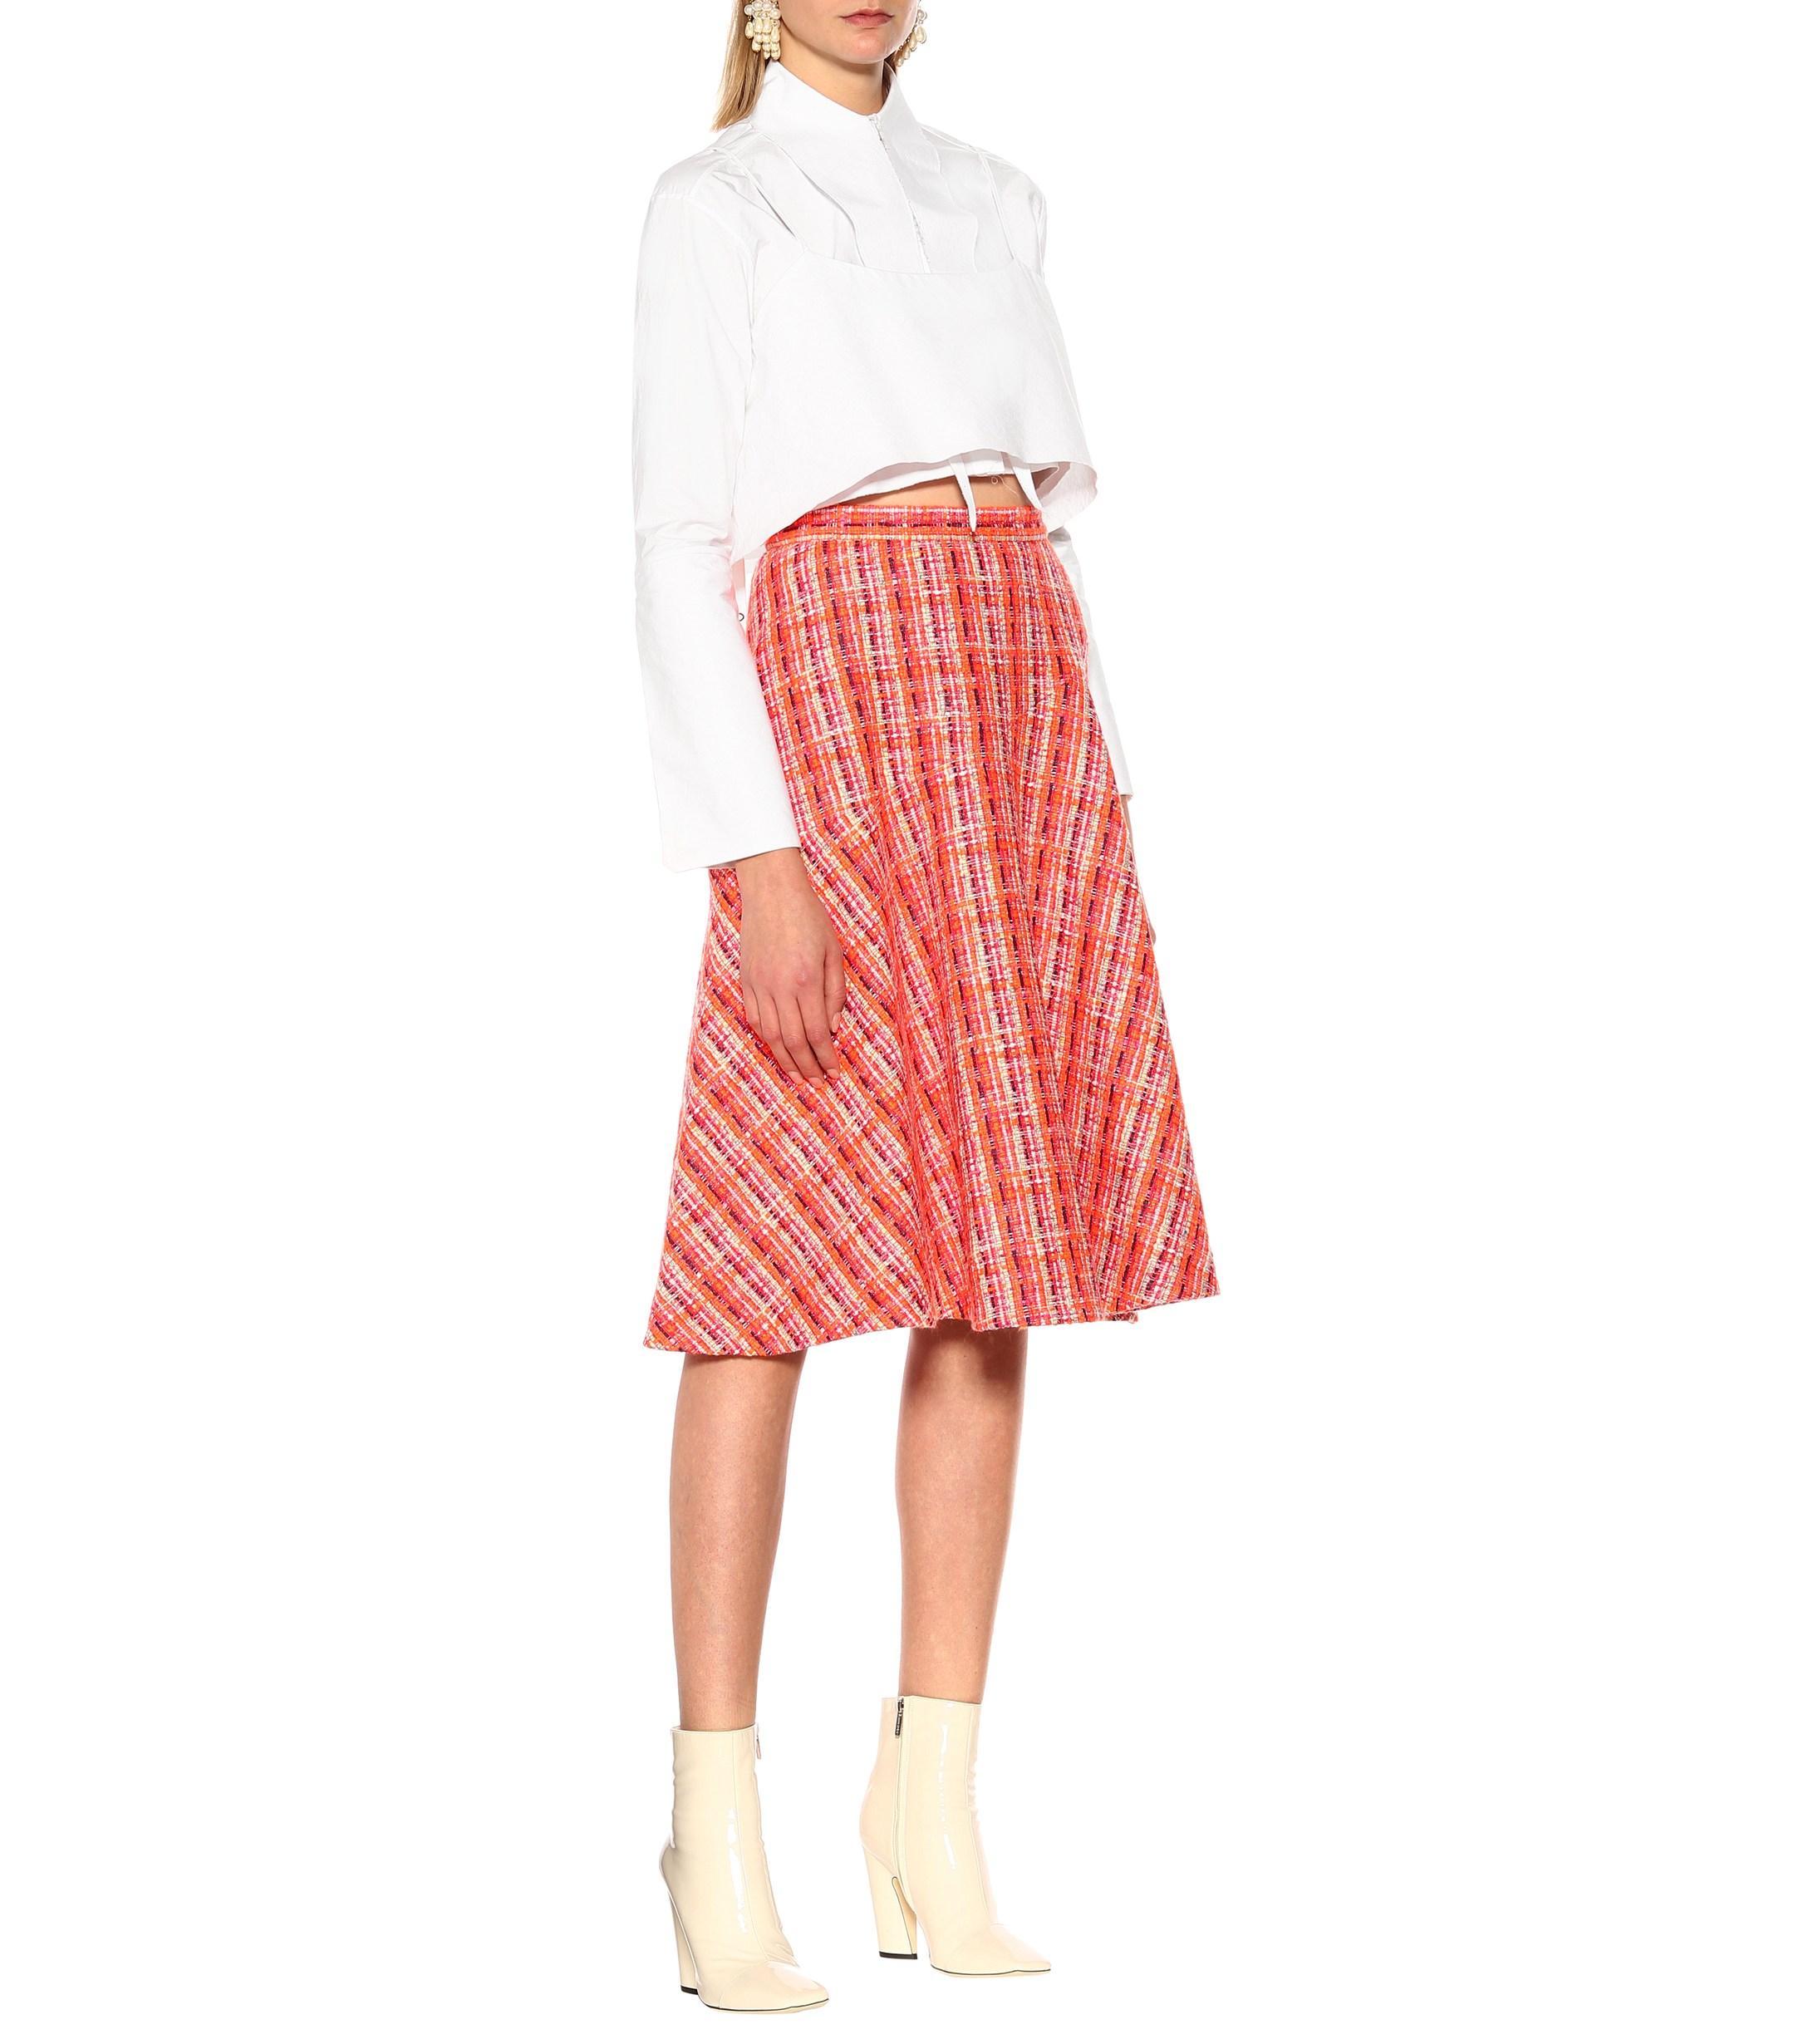 0ac68041ee Delpozo - Pink Tweed Midi Skirt - Lyst. View fullscreen